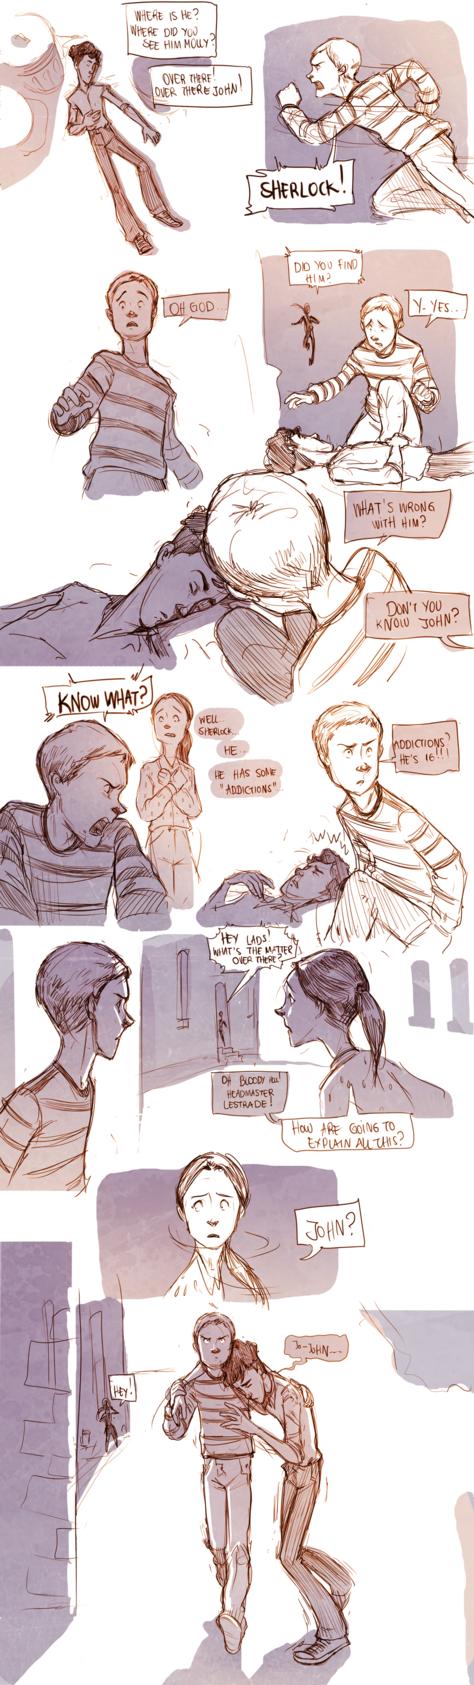 Teen Sherlock - Addictions Part 1 by *DrSlug on deviantART